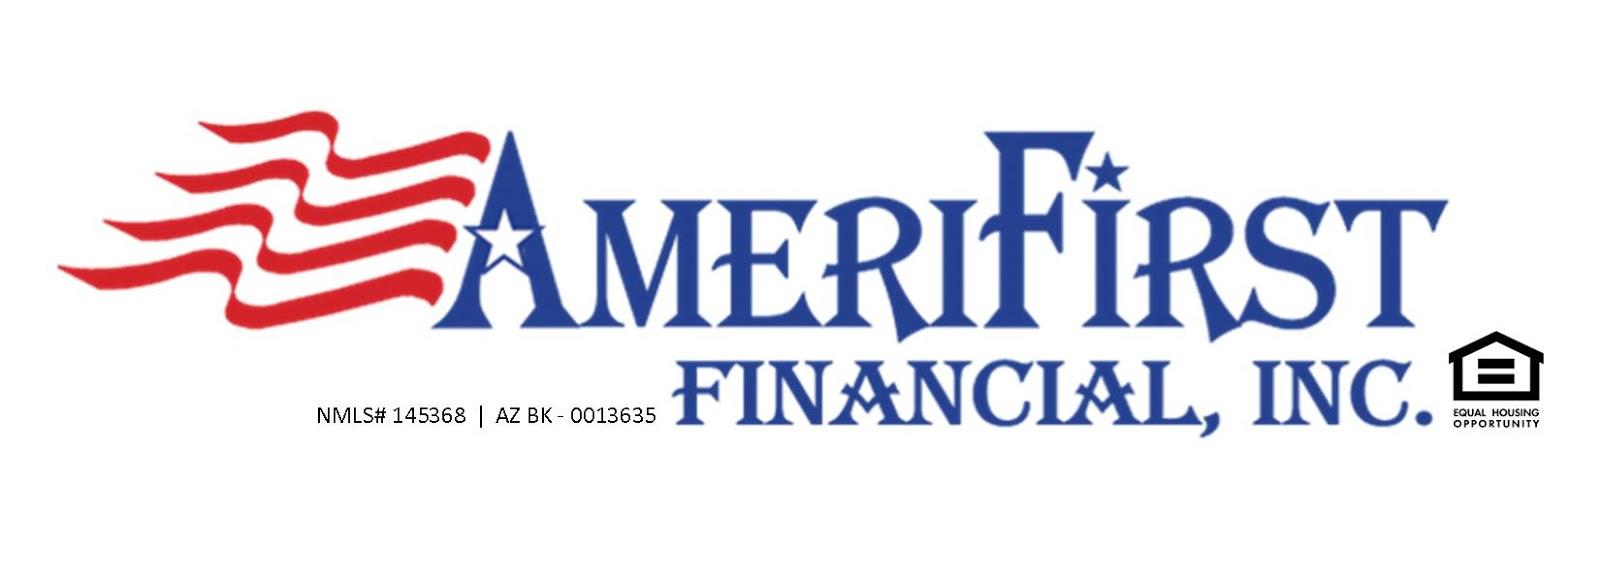 AMERIFIRST FINANCIAL INC